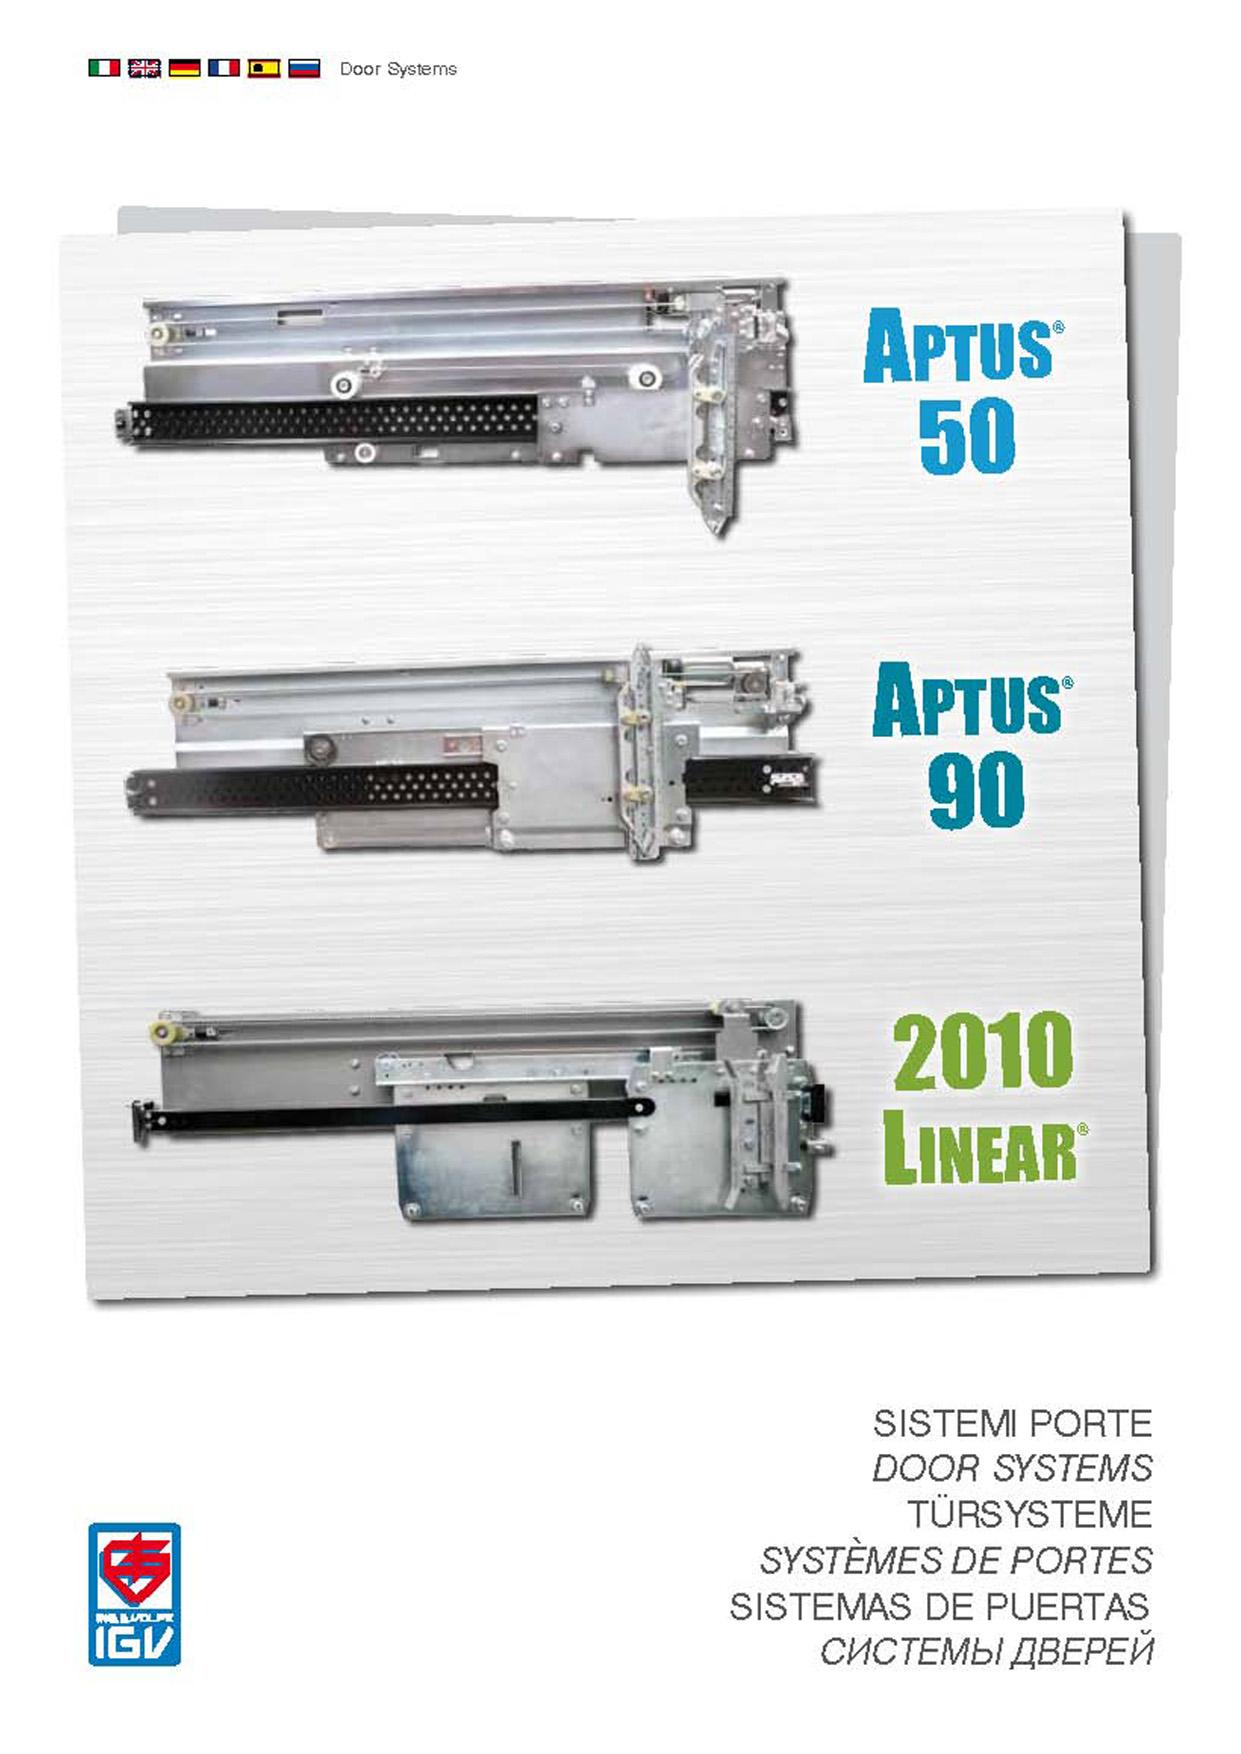 IGV-Sistemi-porte2